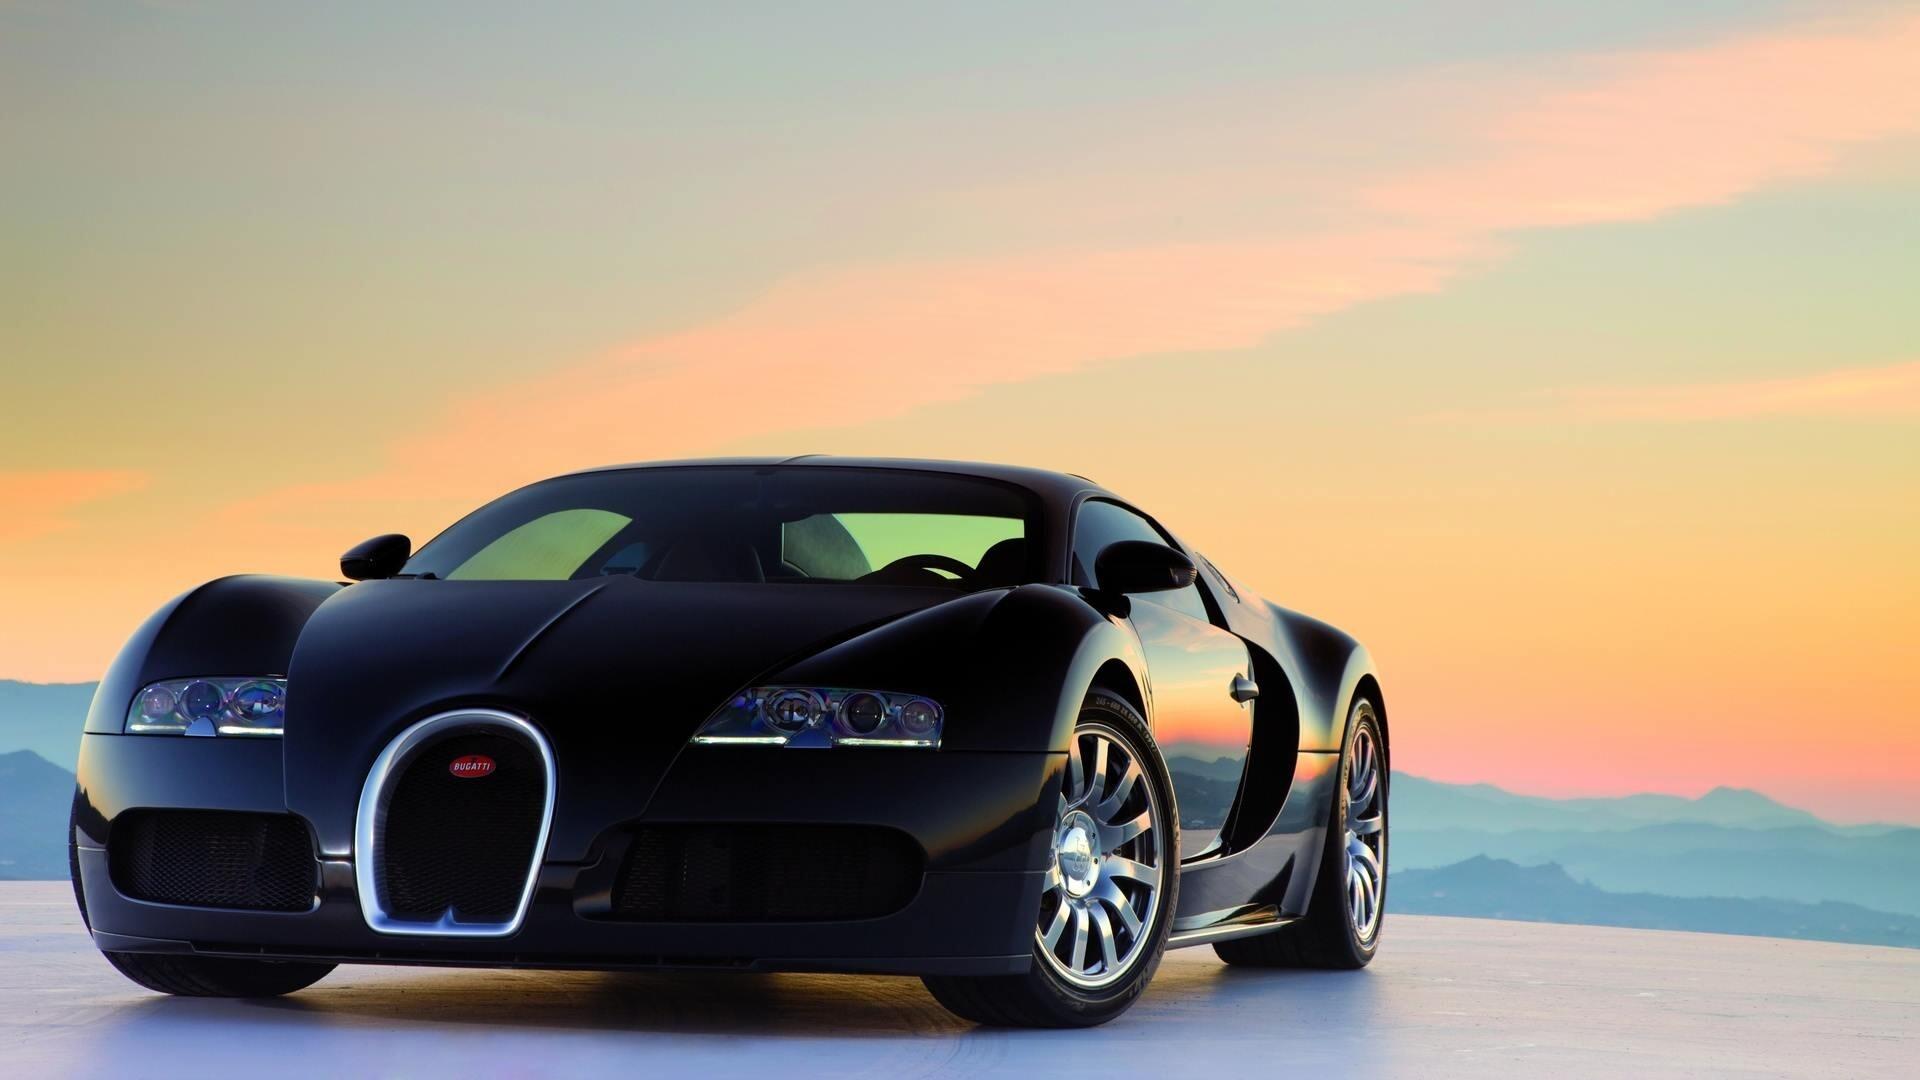 Black Bugatti Car Image   HD Wallpapers